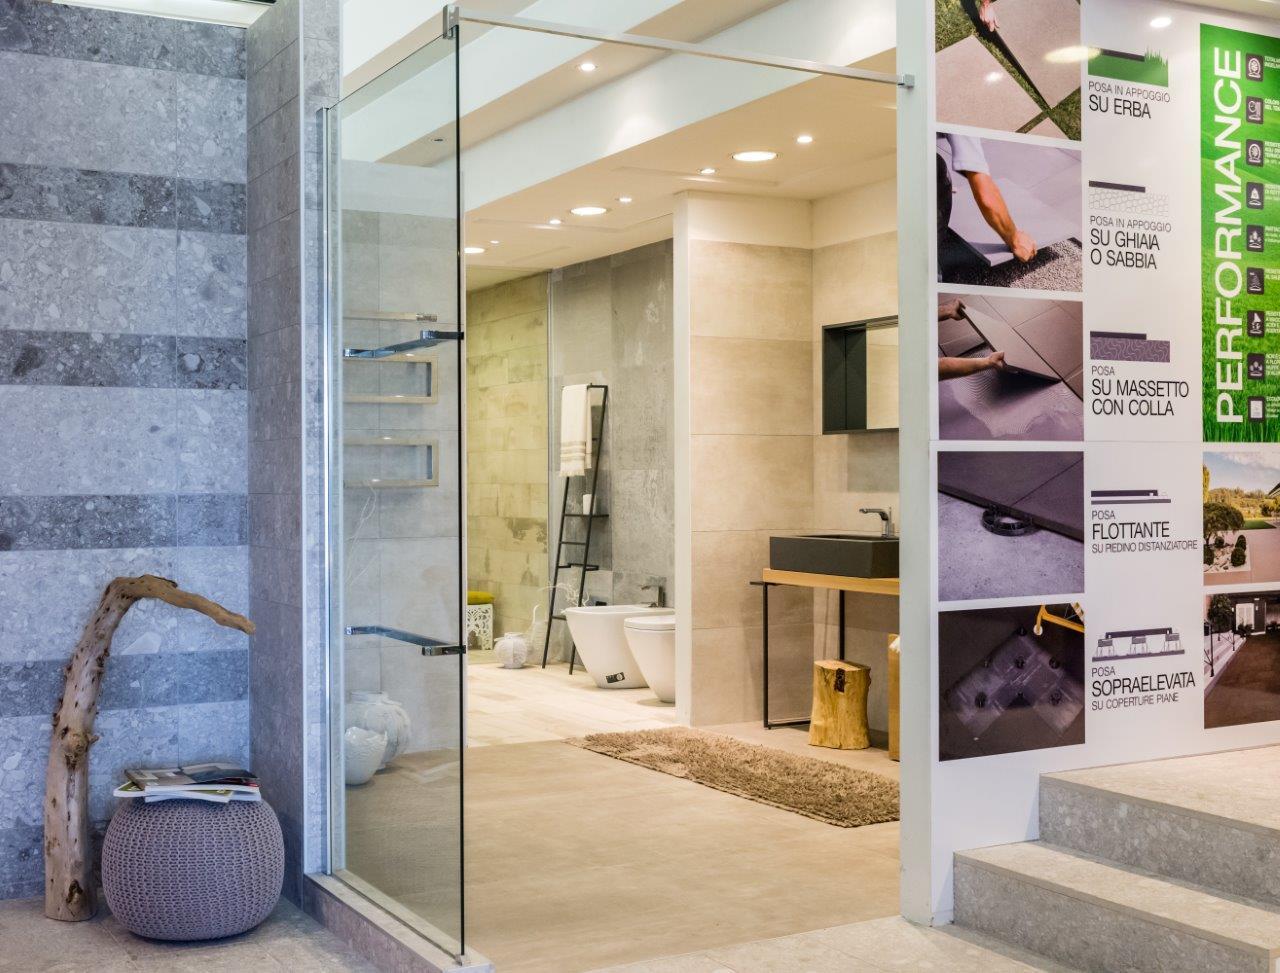 showroom piastrelle, parquet e arredo bagno - zelarino/mestre/venezia - Arredo Bagno Erba